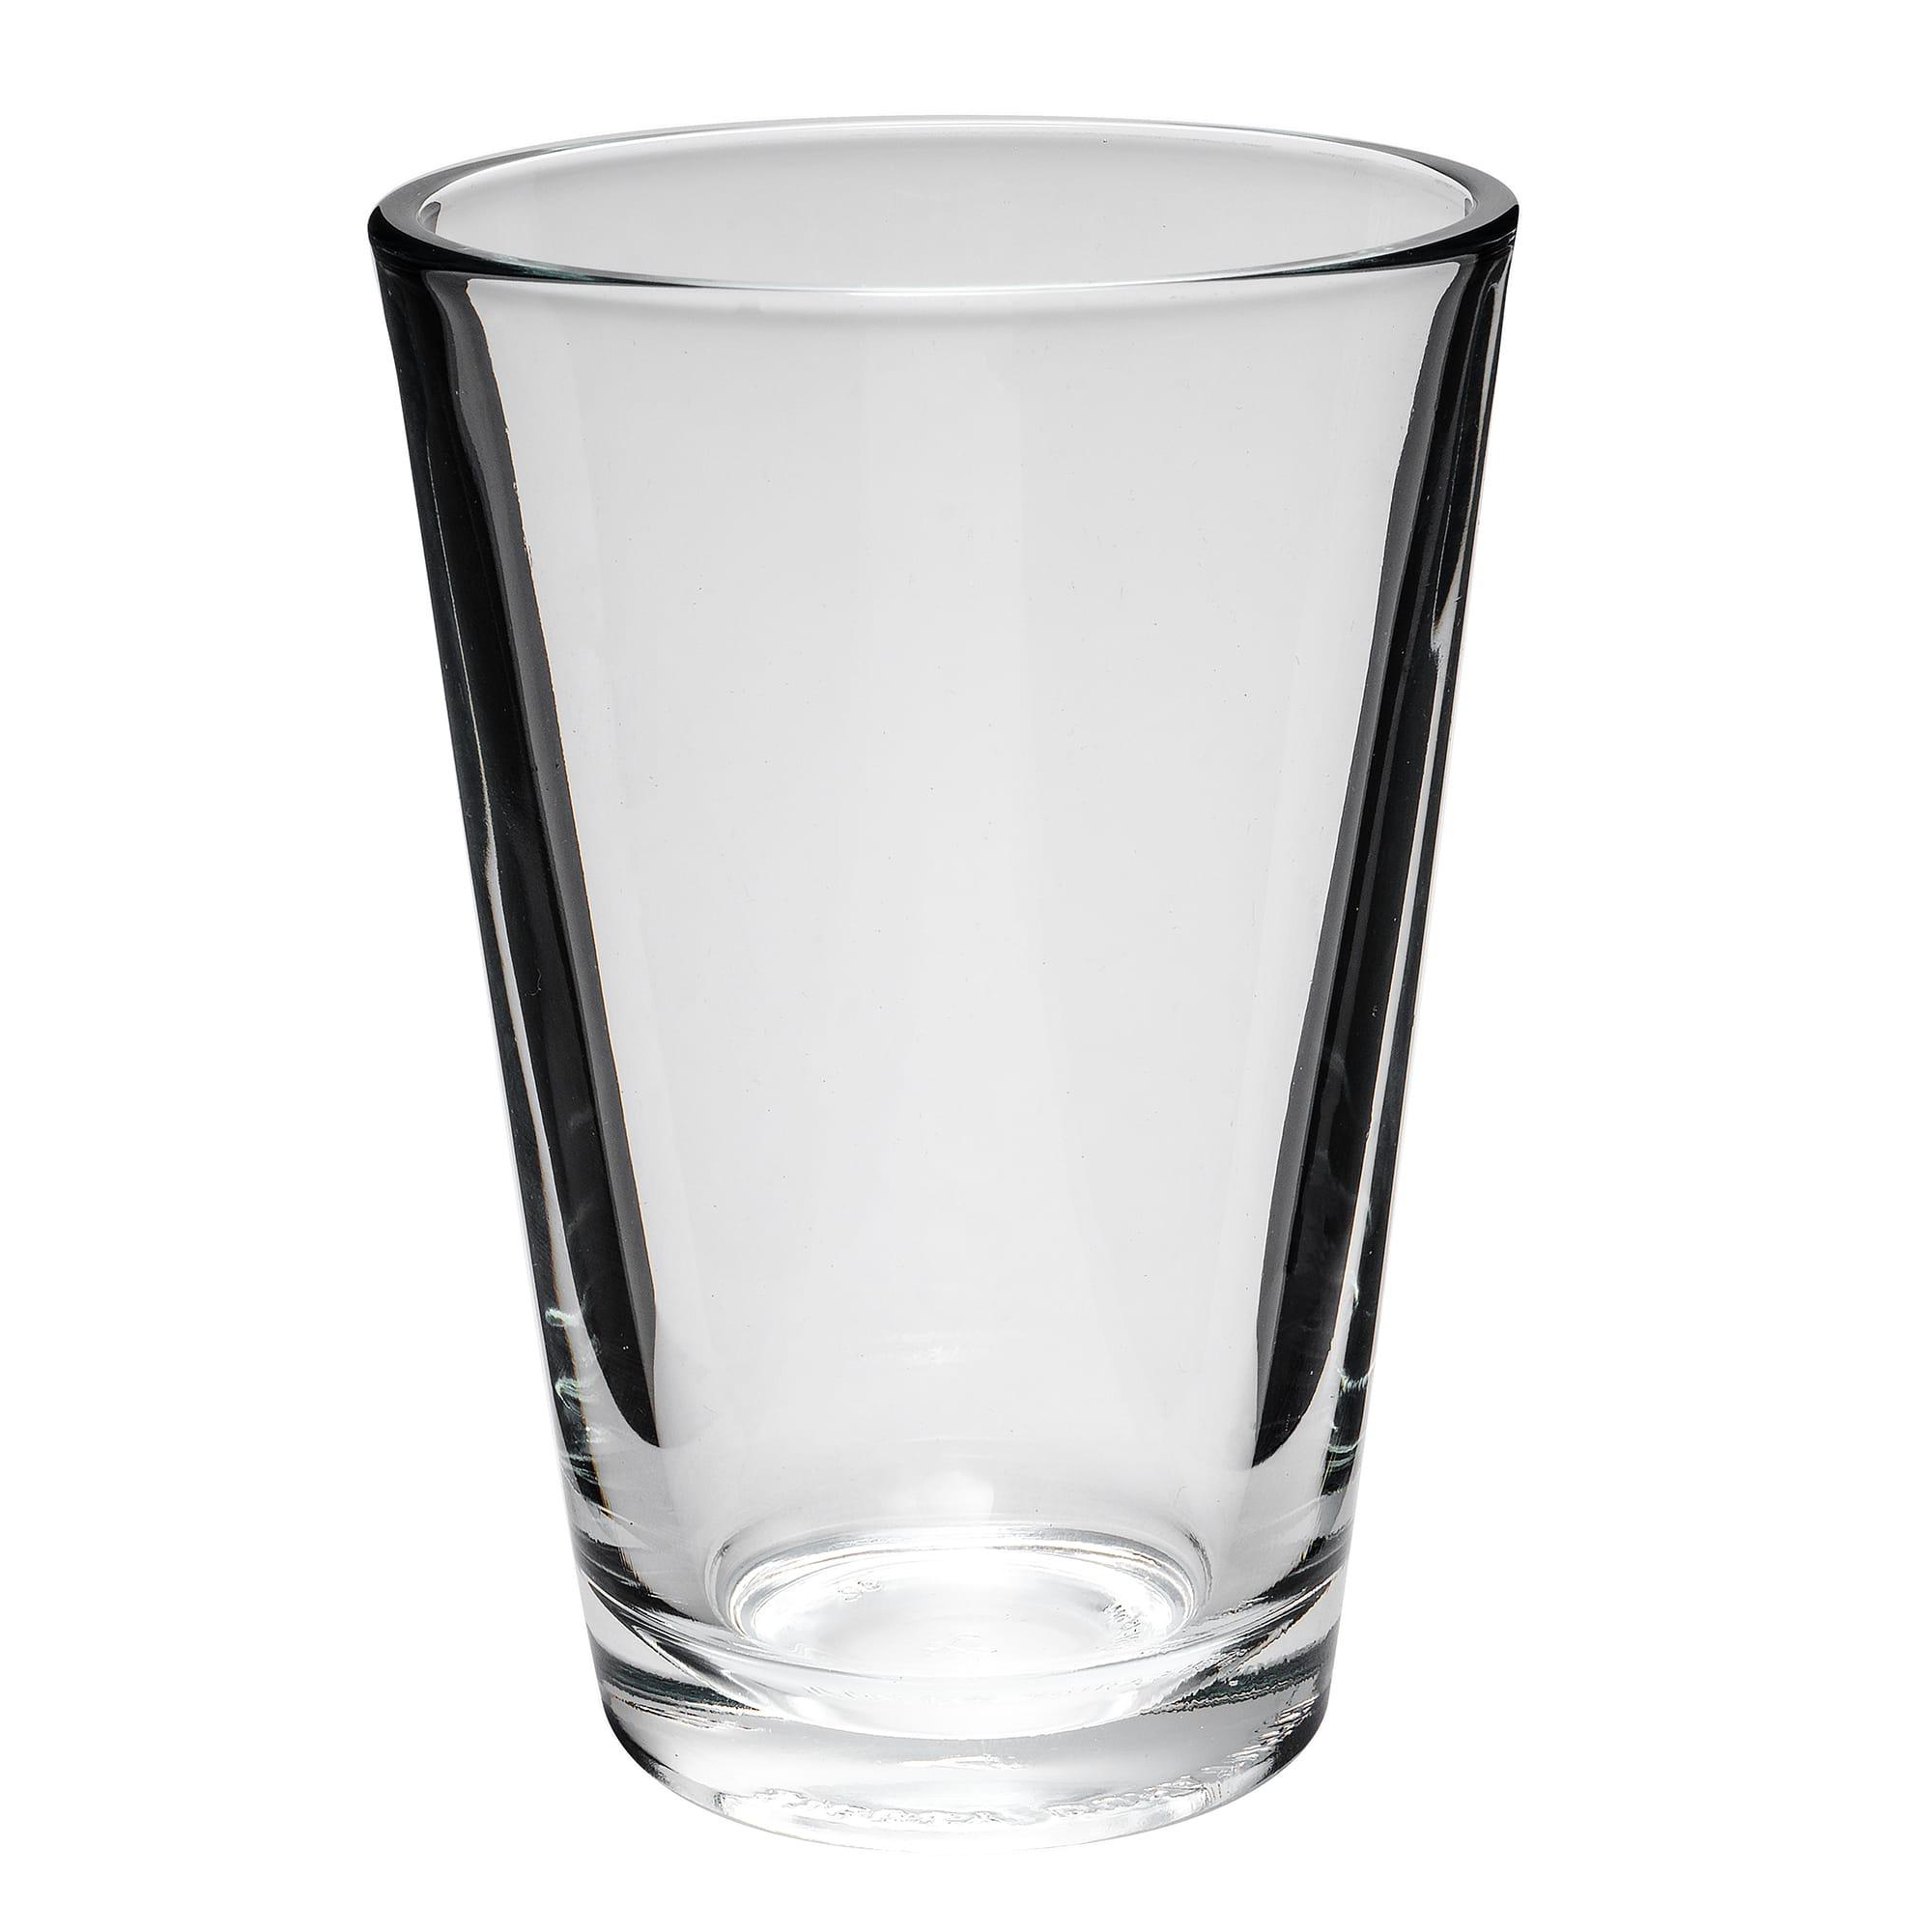 Libbey 15585 9 oz DuraTuff Restaurant Basics Hi-Ball Glass - Safedge Rim